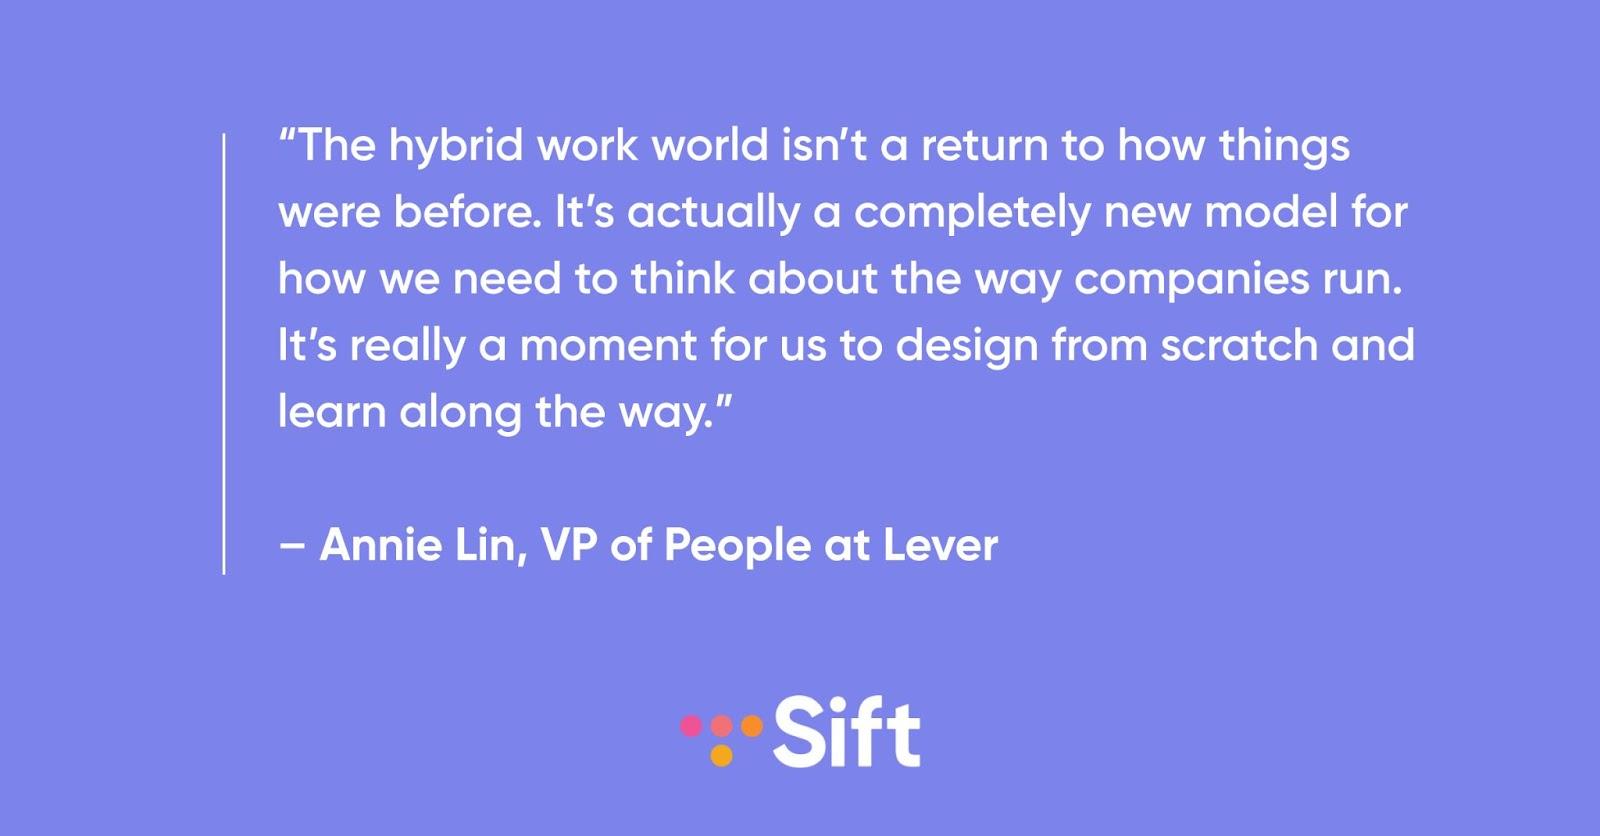 Annie Lin hybrid work culture quote